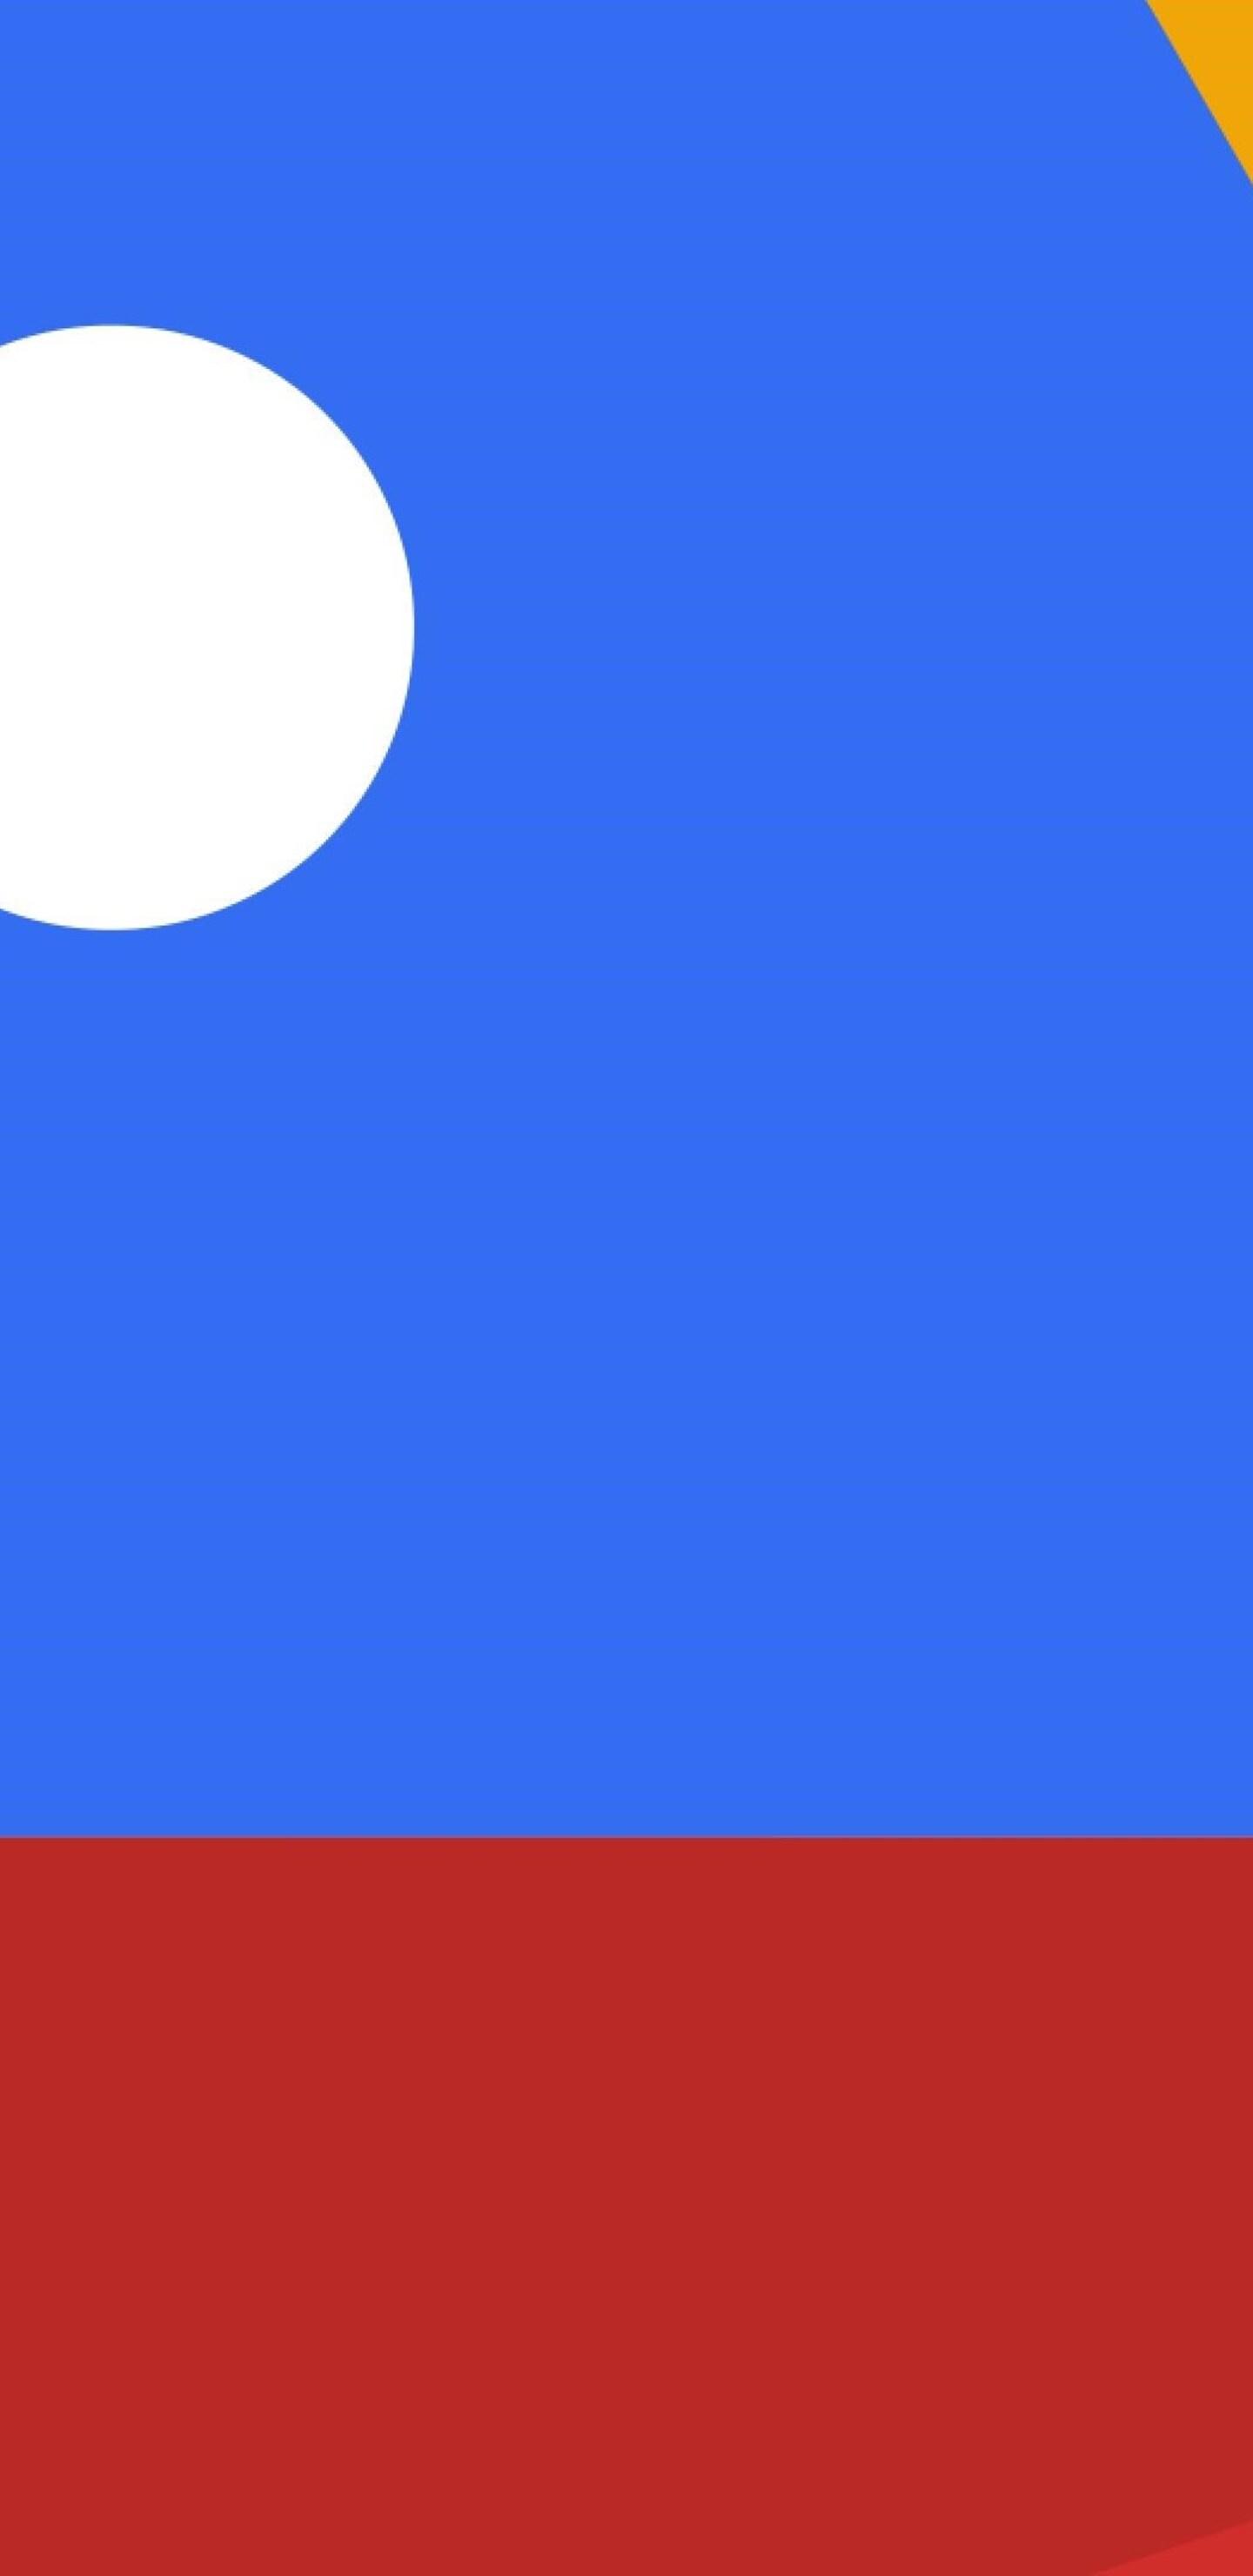 Google Wallpaper 4k - impremedia.net